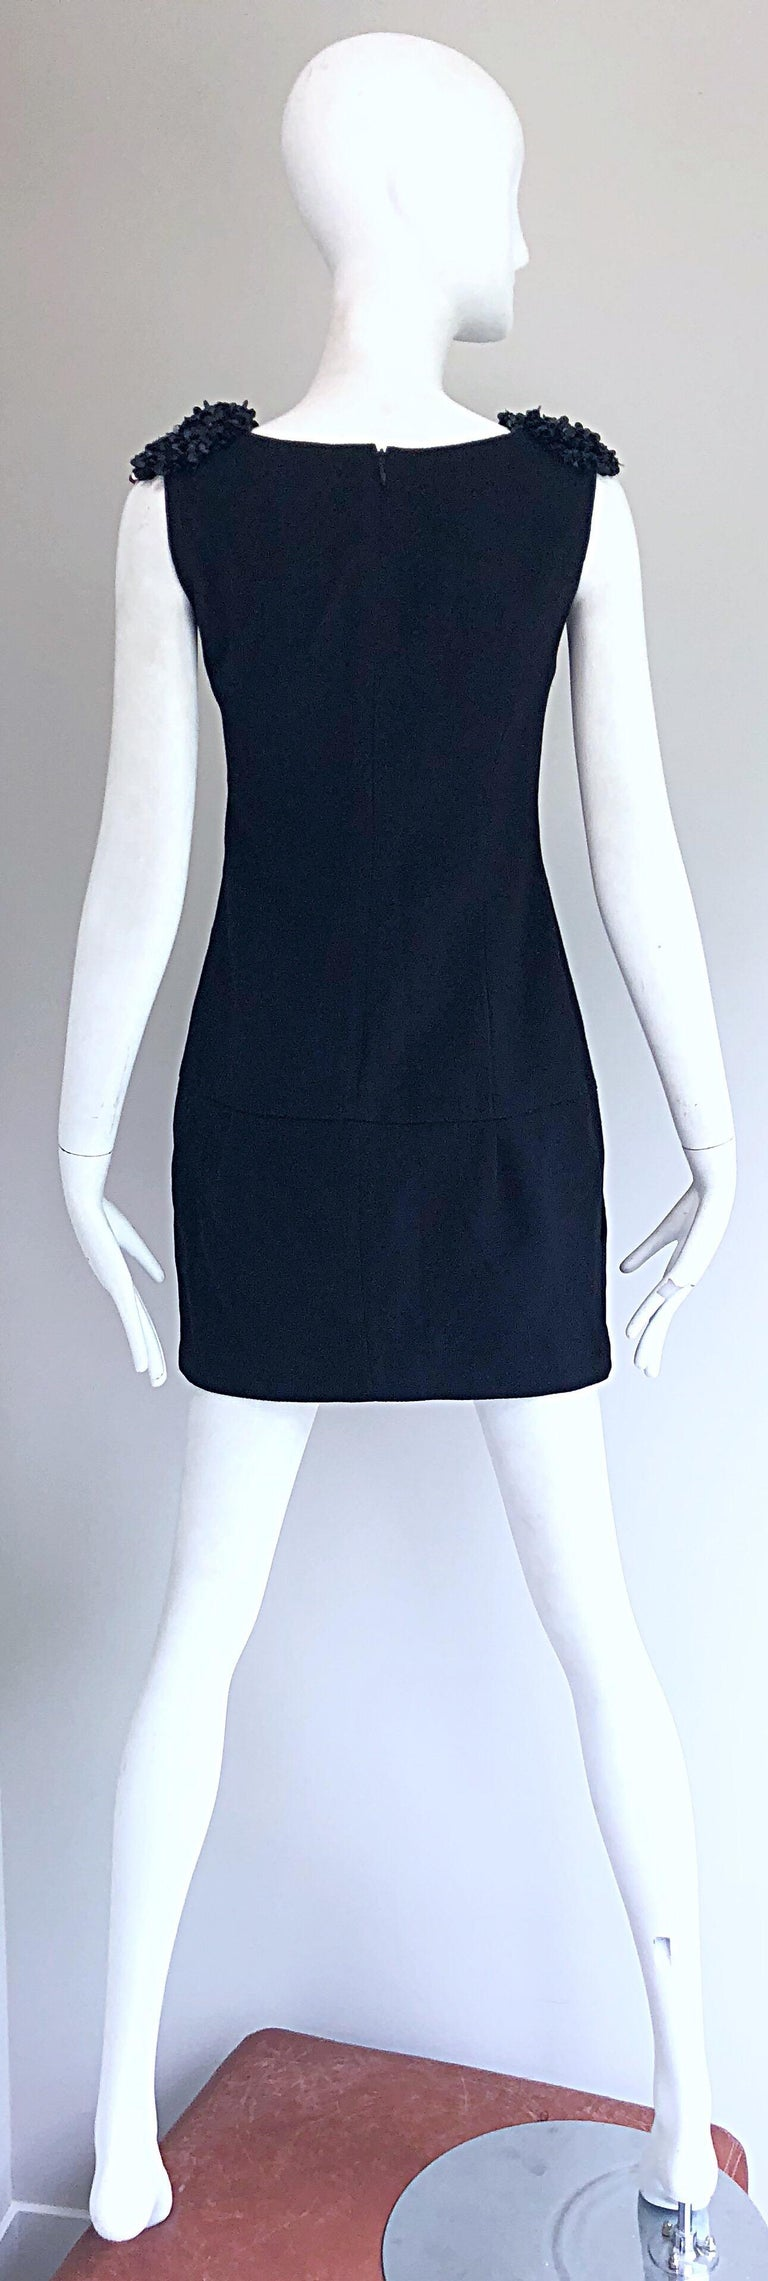 1990s Miu Miu Black Virgin Wool Sequin Beaded Vintage 90s Mini Dress For Sale 1